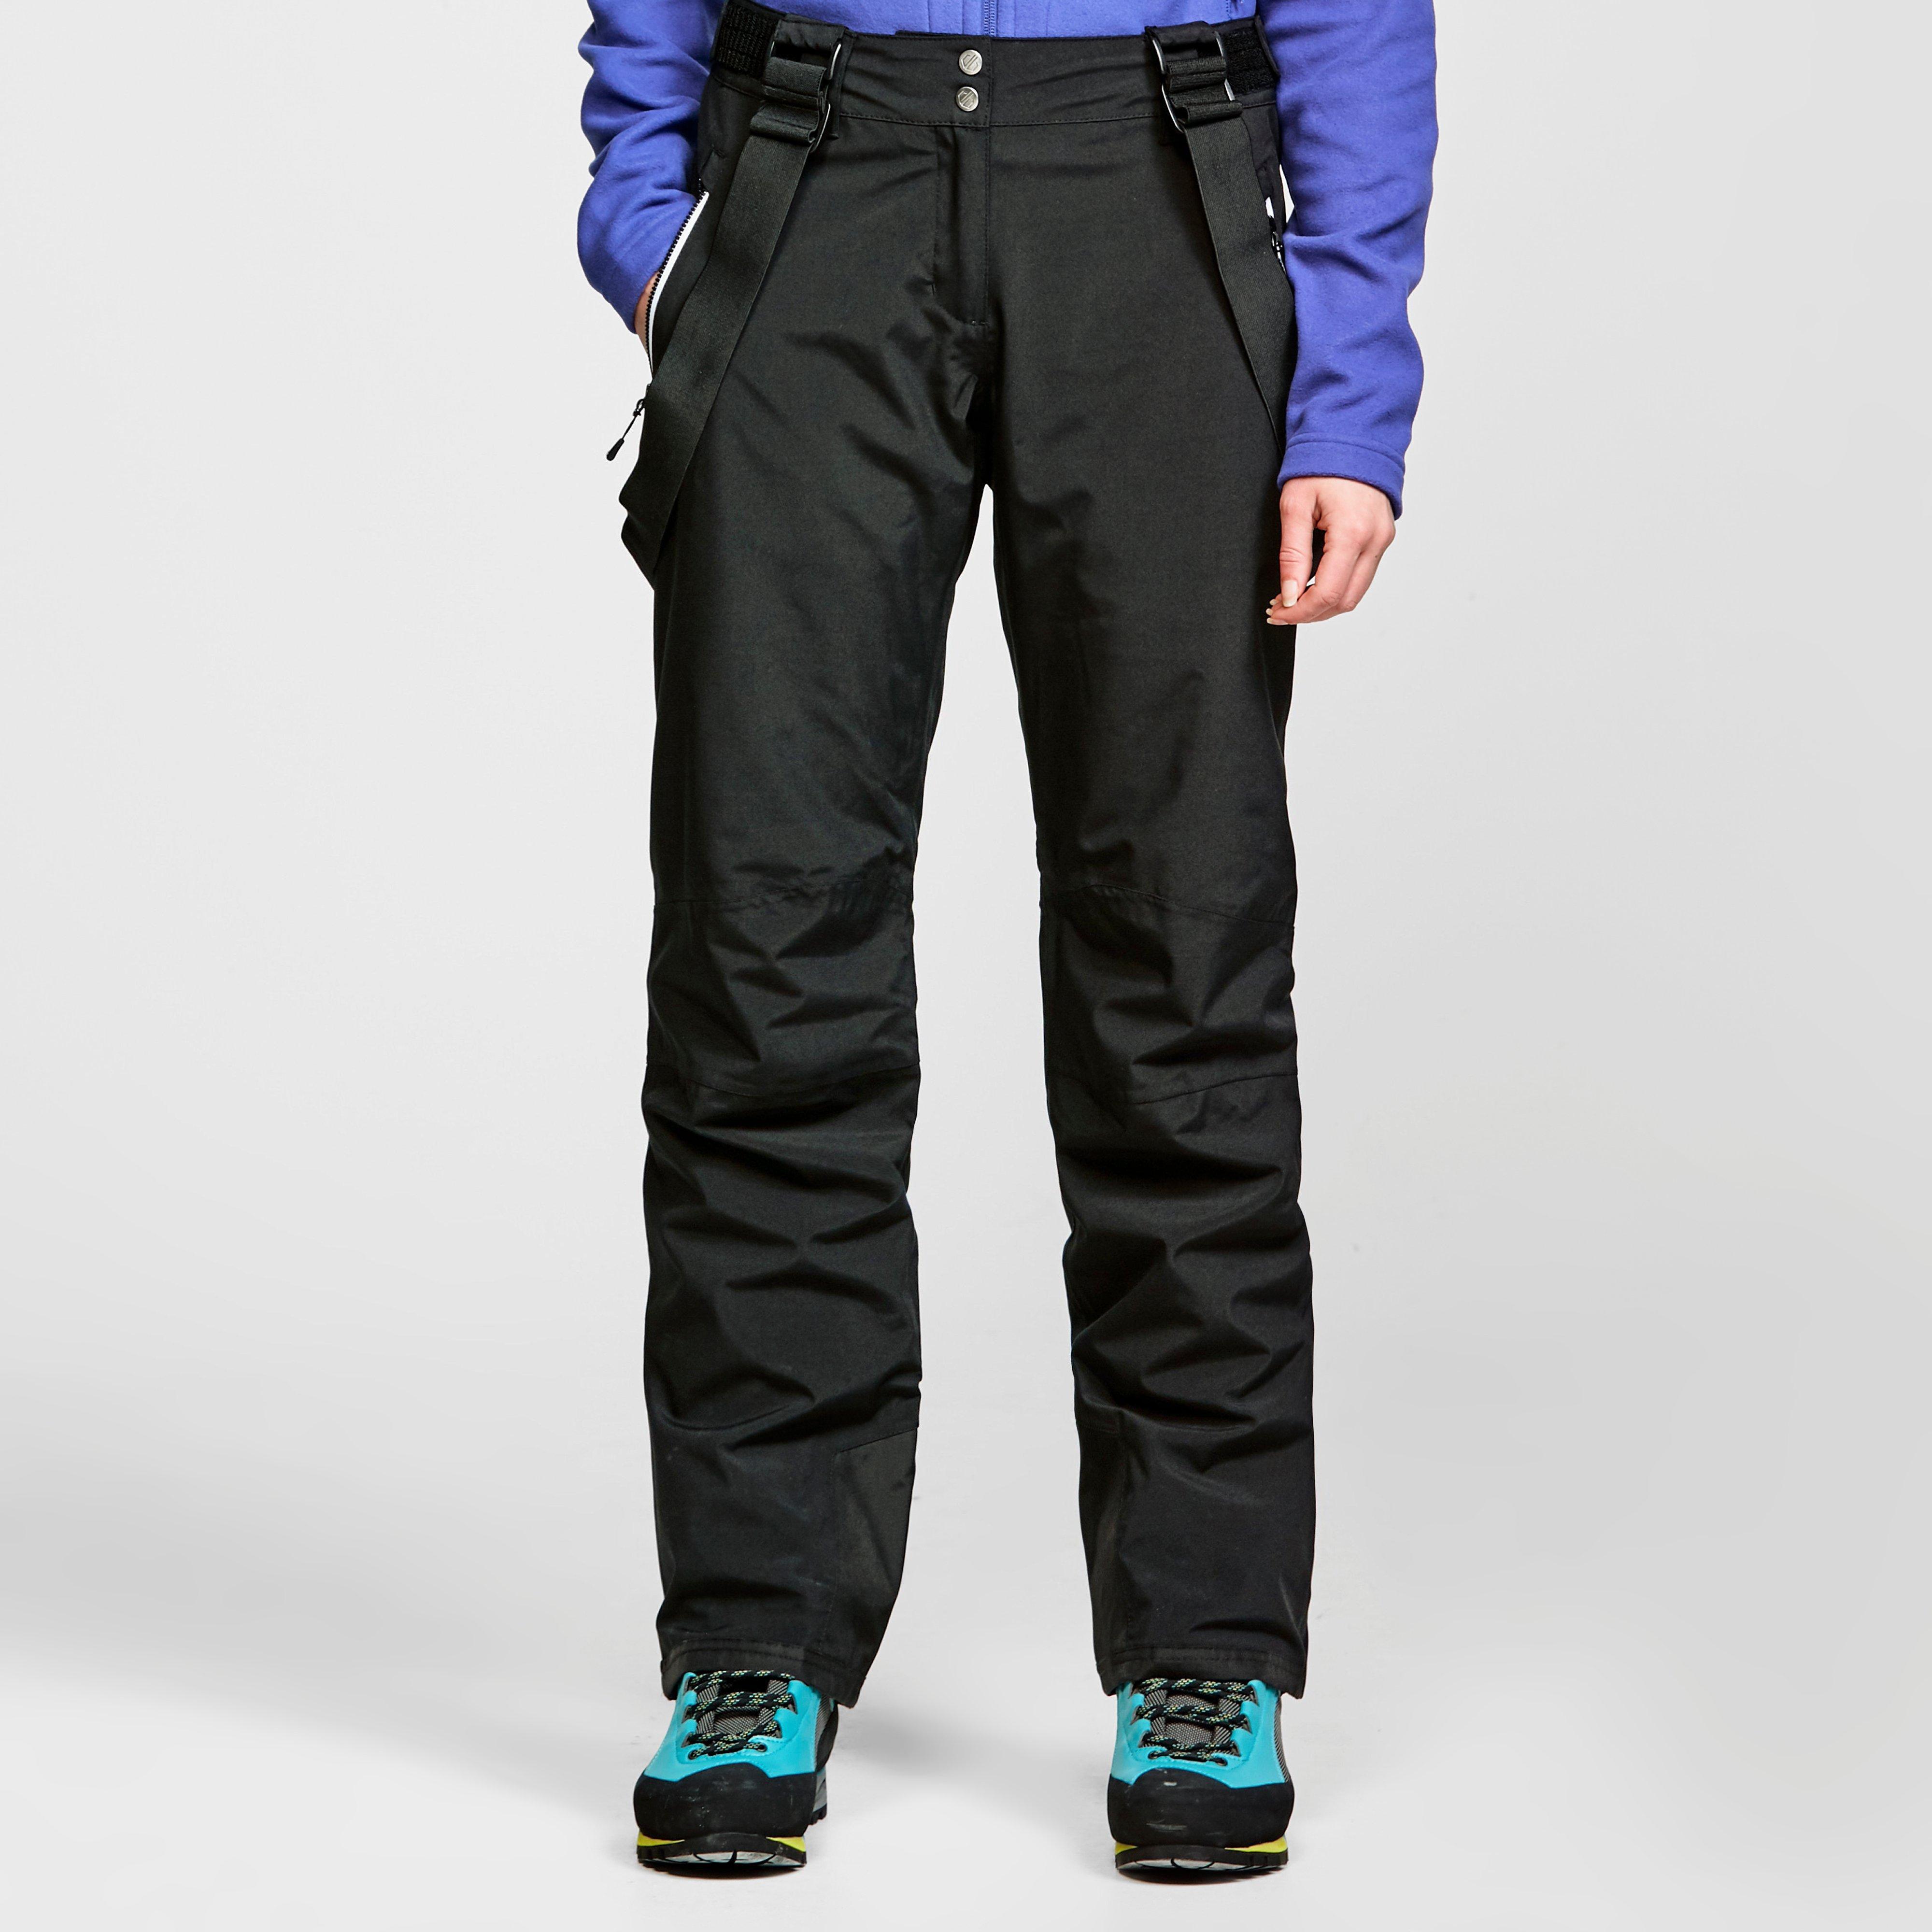 Dare 2B Women's Effused Ski Pants - Black, Black